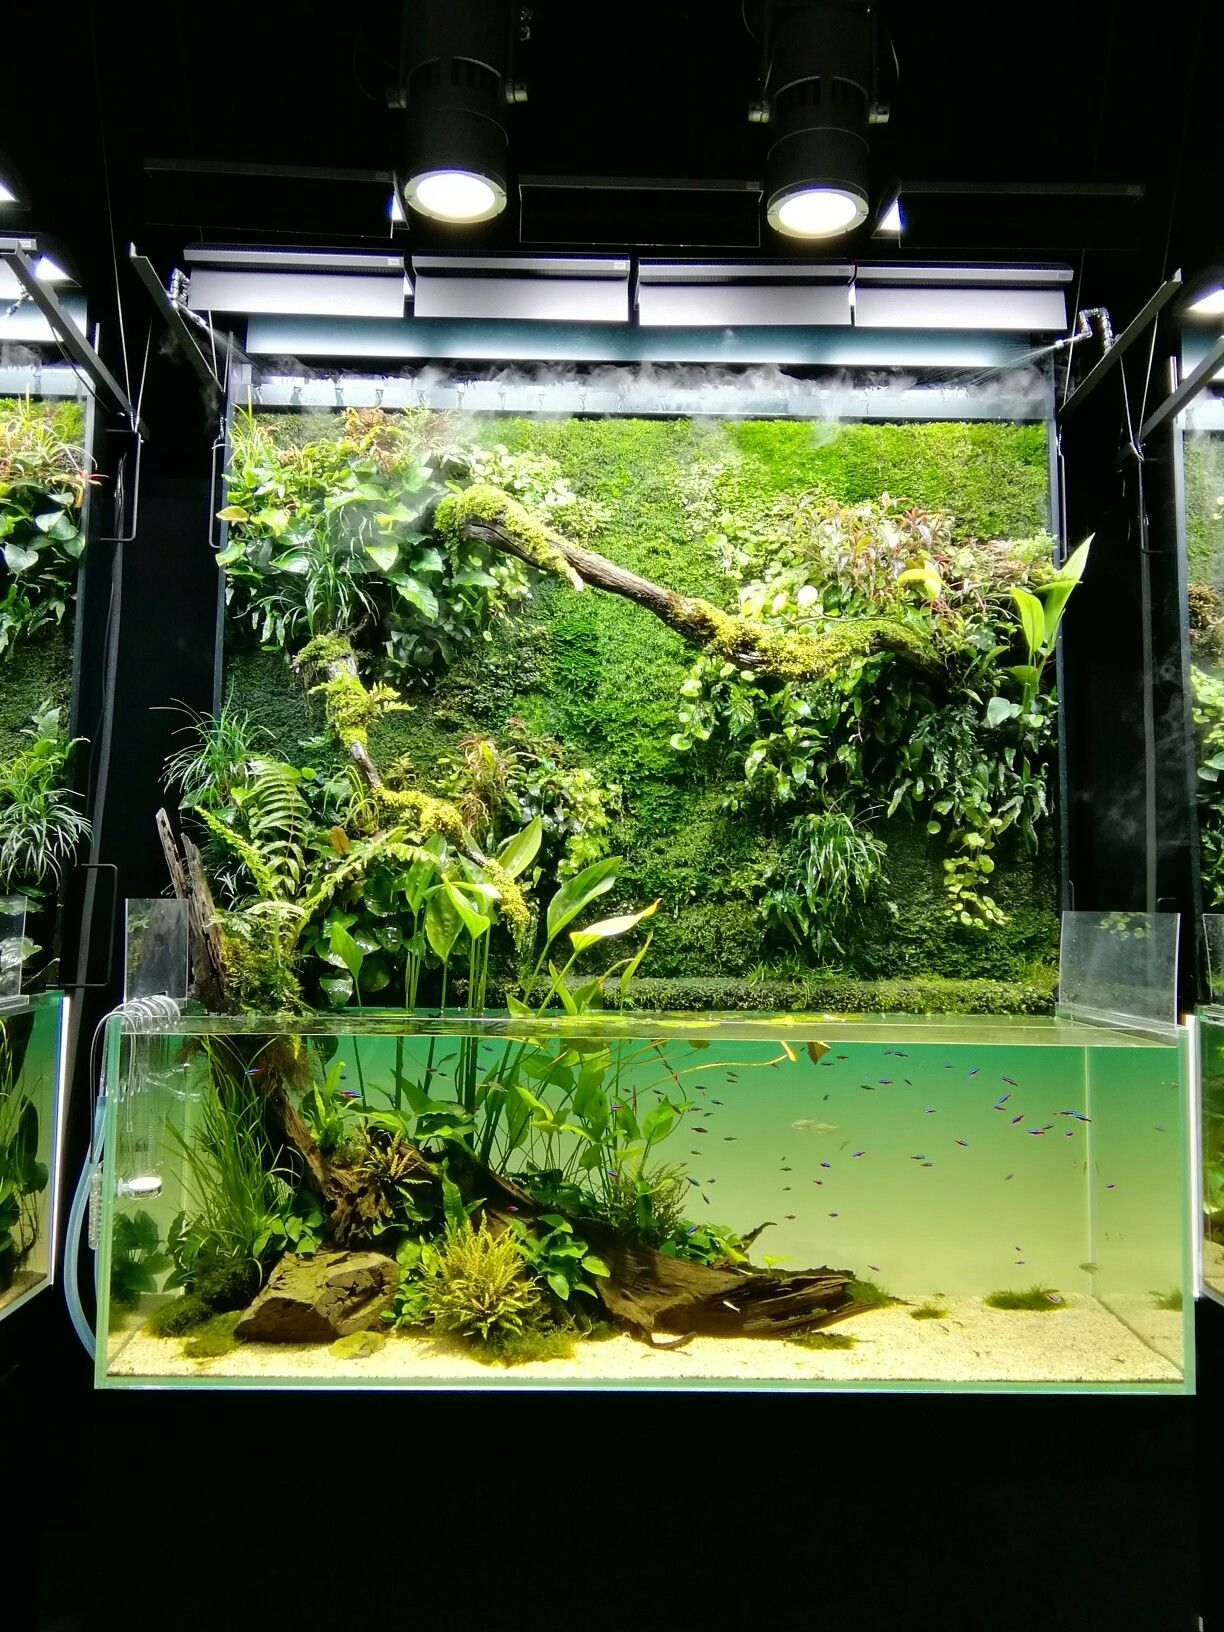 Nature Aquarium Takashi Amano 天野尚 水草水槽 淡水魚のアクアリウム テラリウム